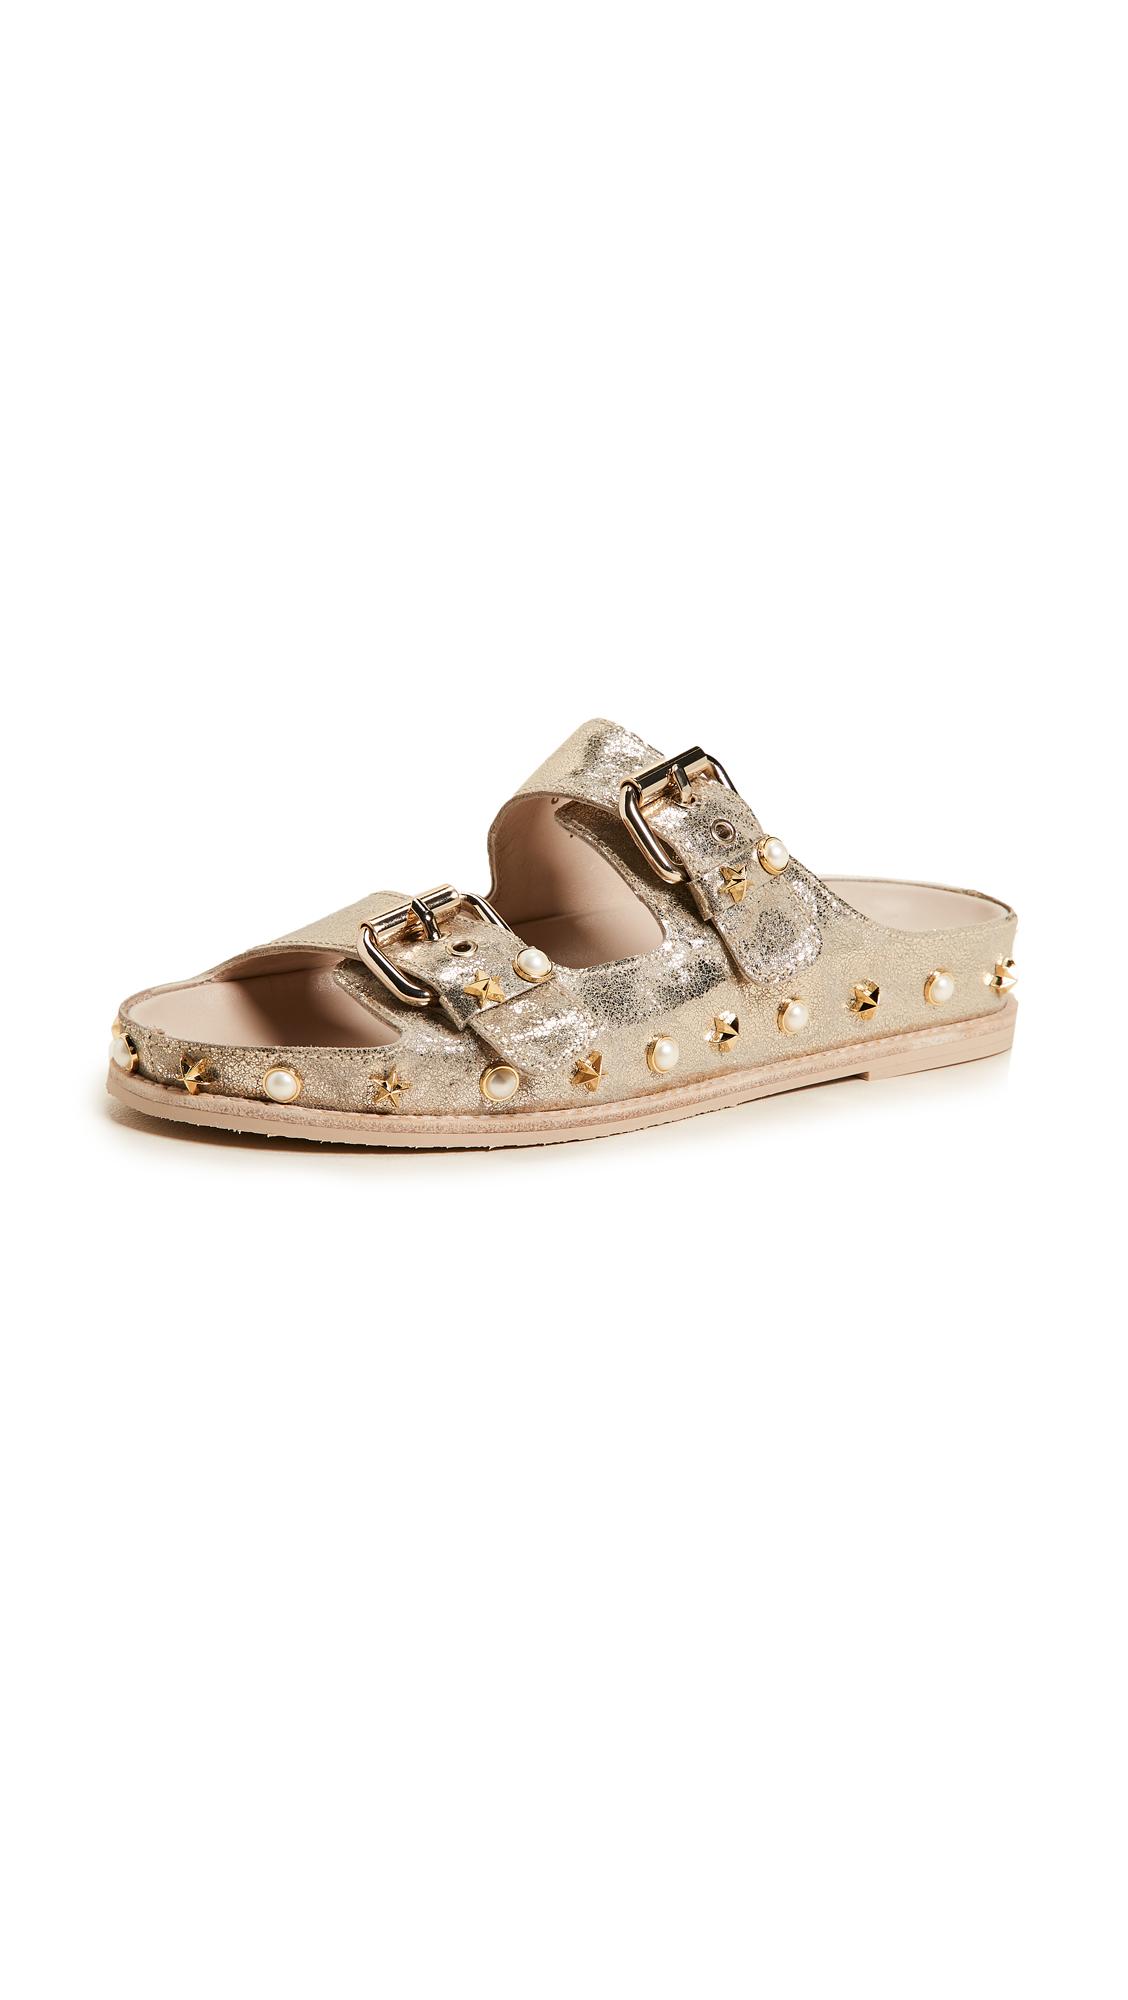 Stuart Weitzman Sandbar Sandals - Cava